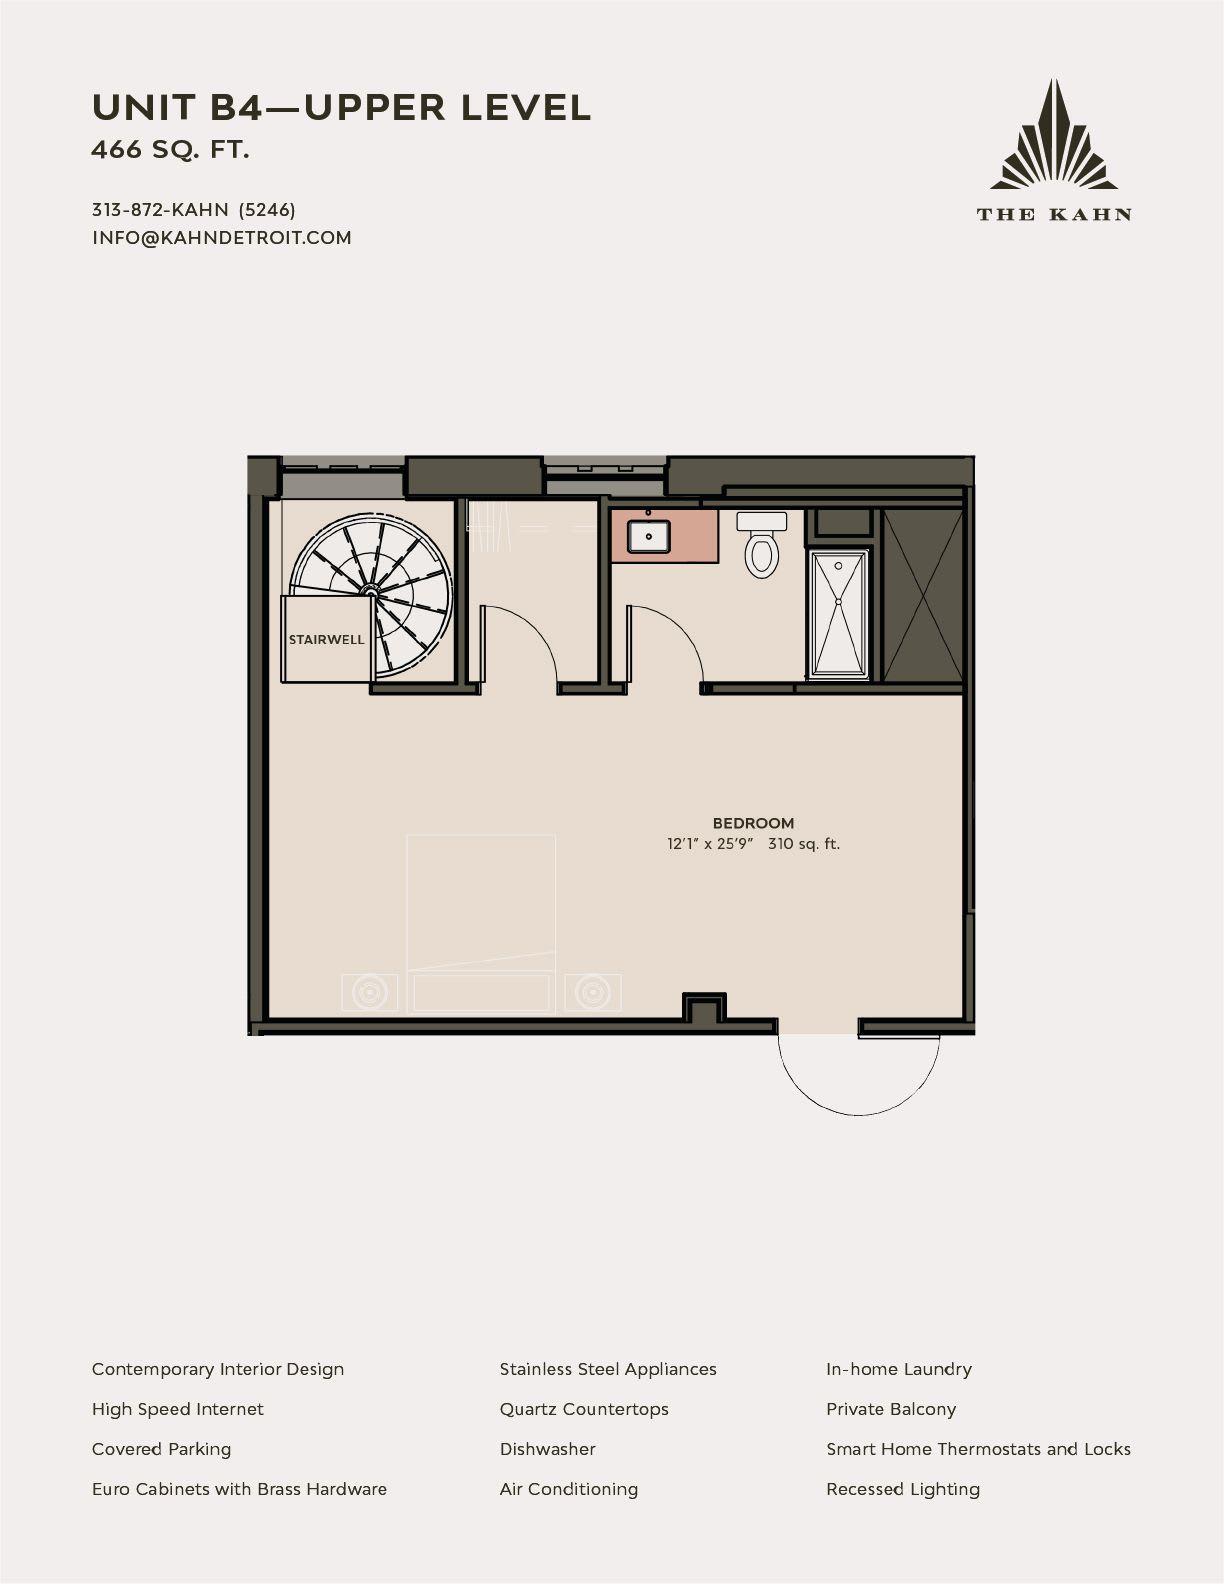 B4 floor plan image at The Kahn in Detroit, Michigan